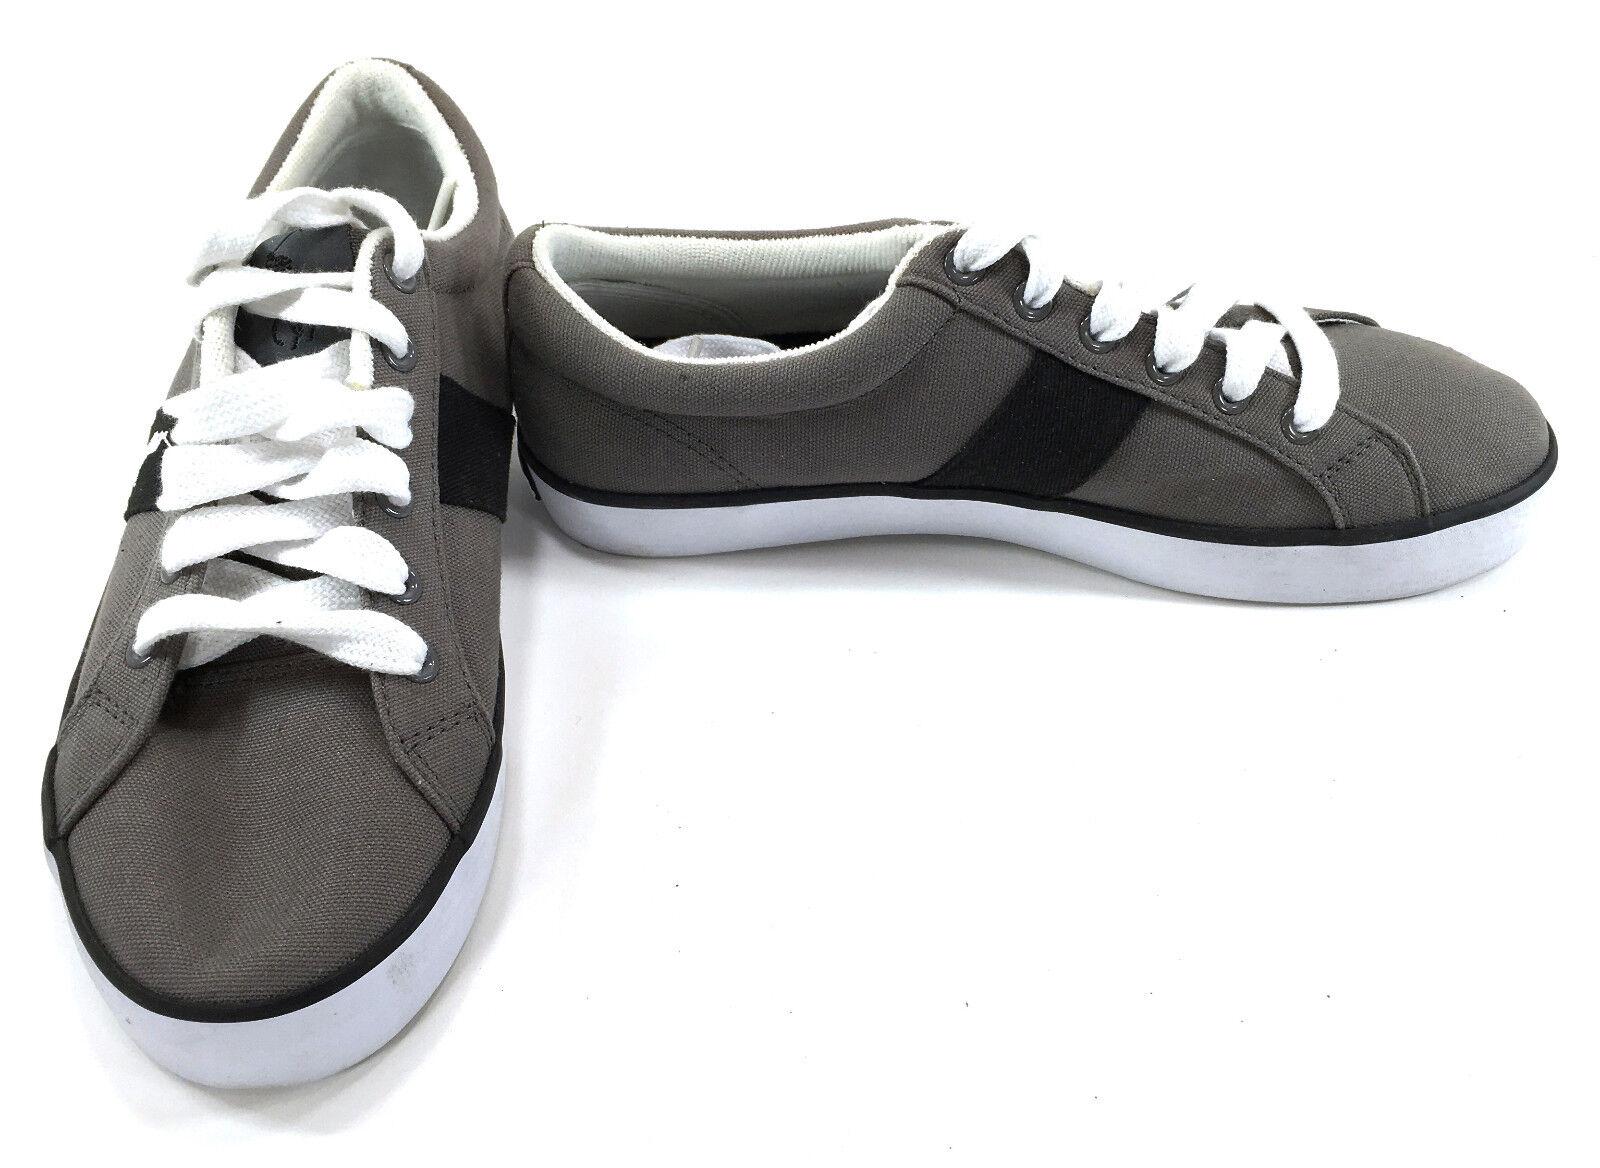 Polo Ralph Lauren Gray Schuhes Giles Athletic Canvas Gray Lauren Sneakers Größe 8 4442b1